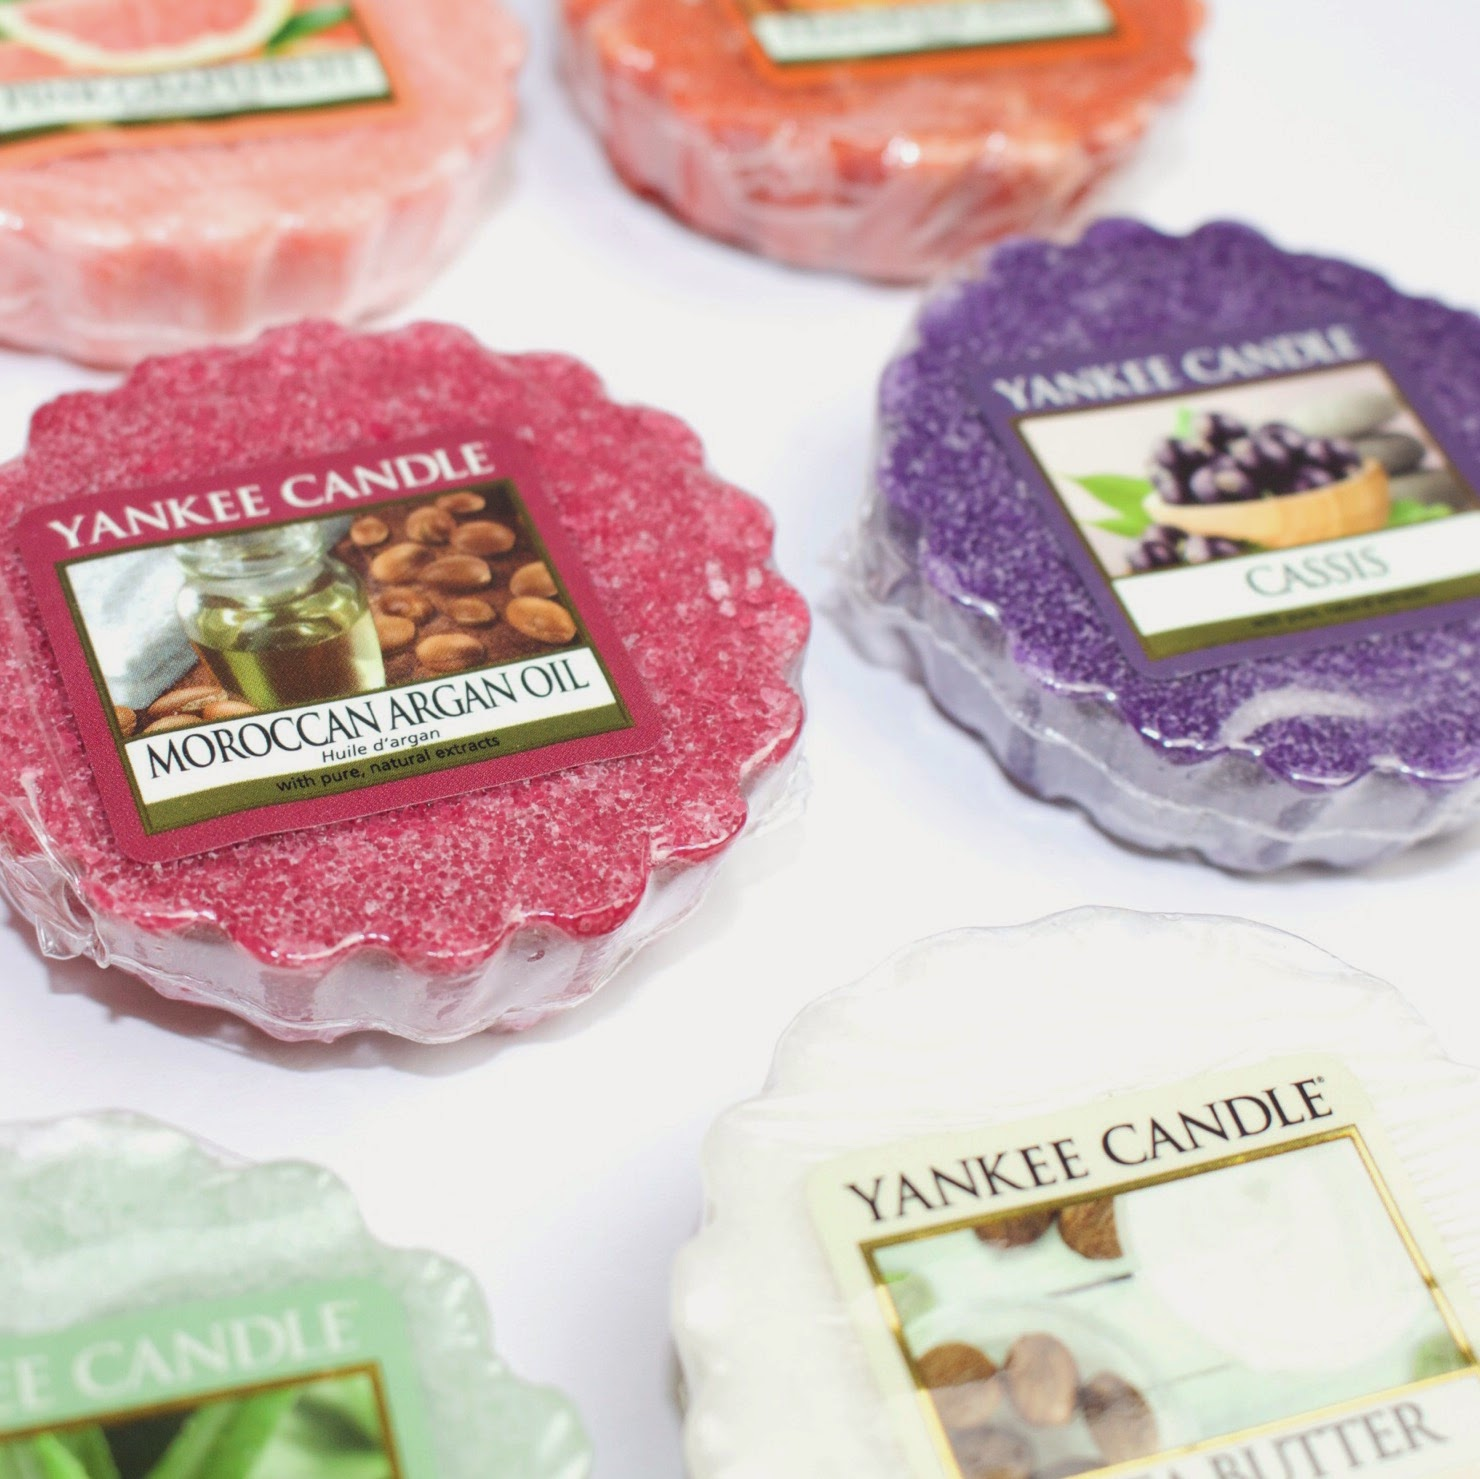 Yankee-Candle-Spring-Frühling-2015-Kerzen-Shoppinator-Candle-Dream-Moroccan-Argan-Oil-Oud-Oasis-Red-Raspberry-Shea-Butter-Aloe-Vera-Pink-Grapefruit-Cassis-Frankincense